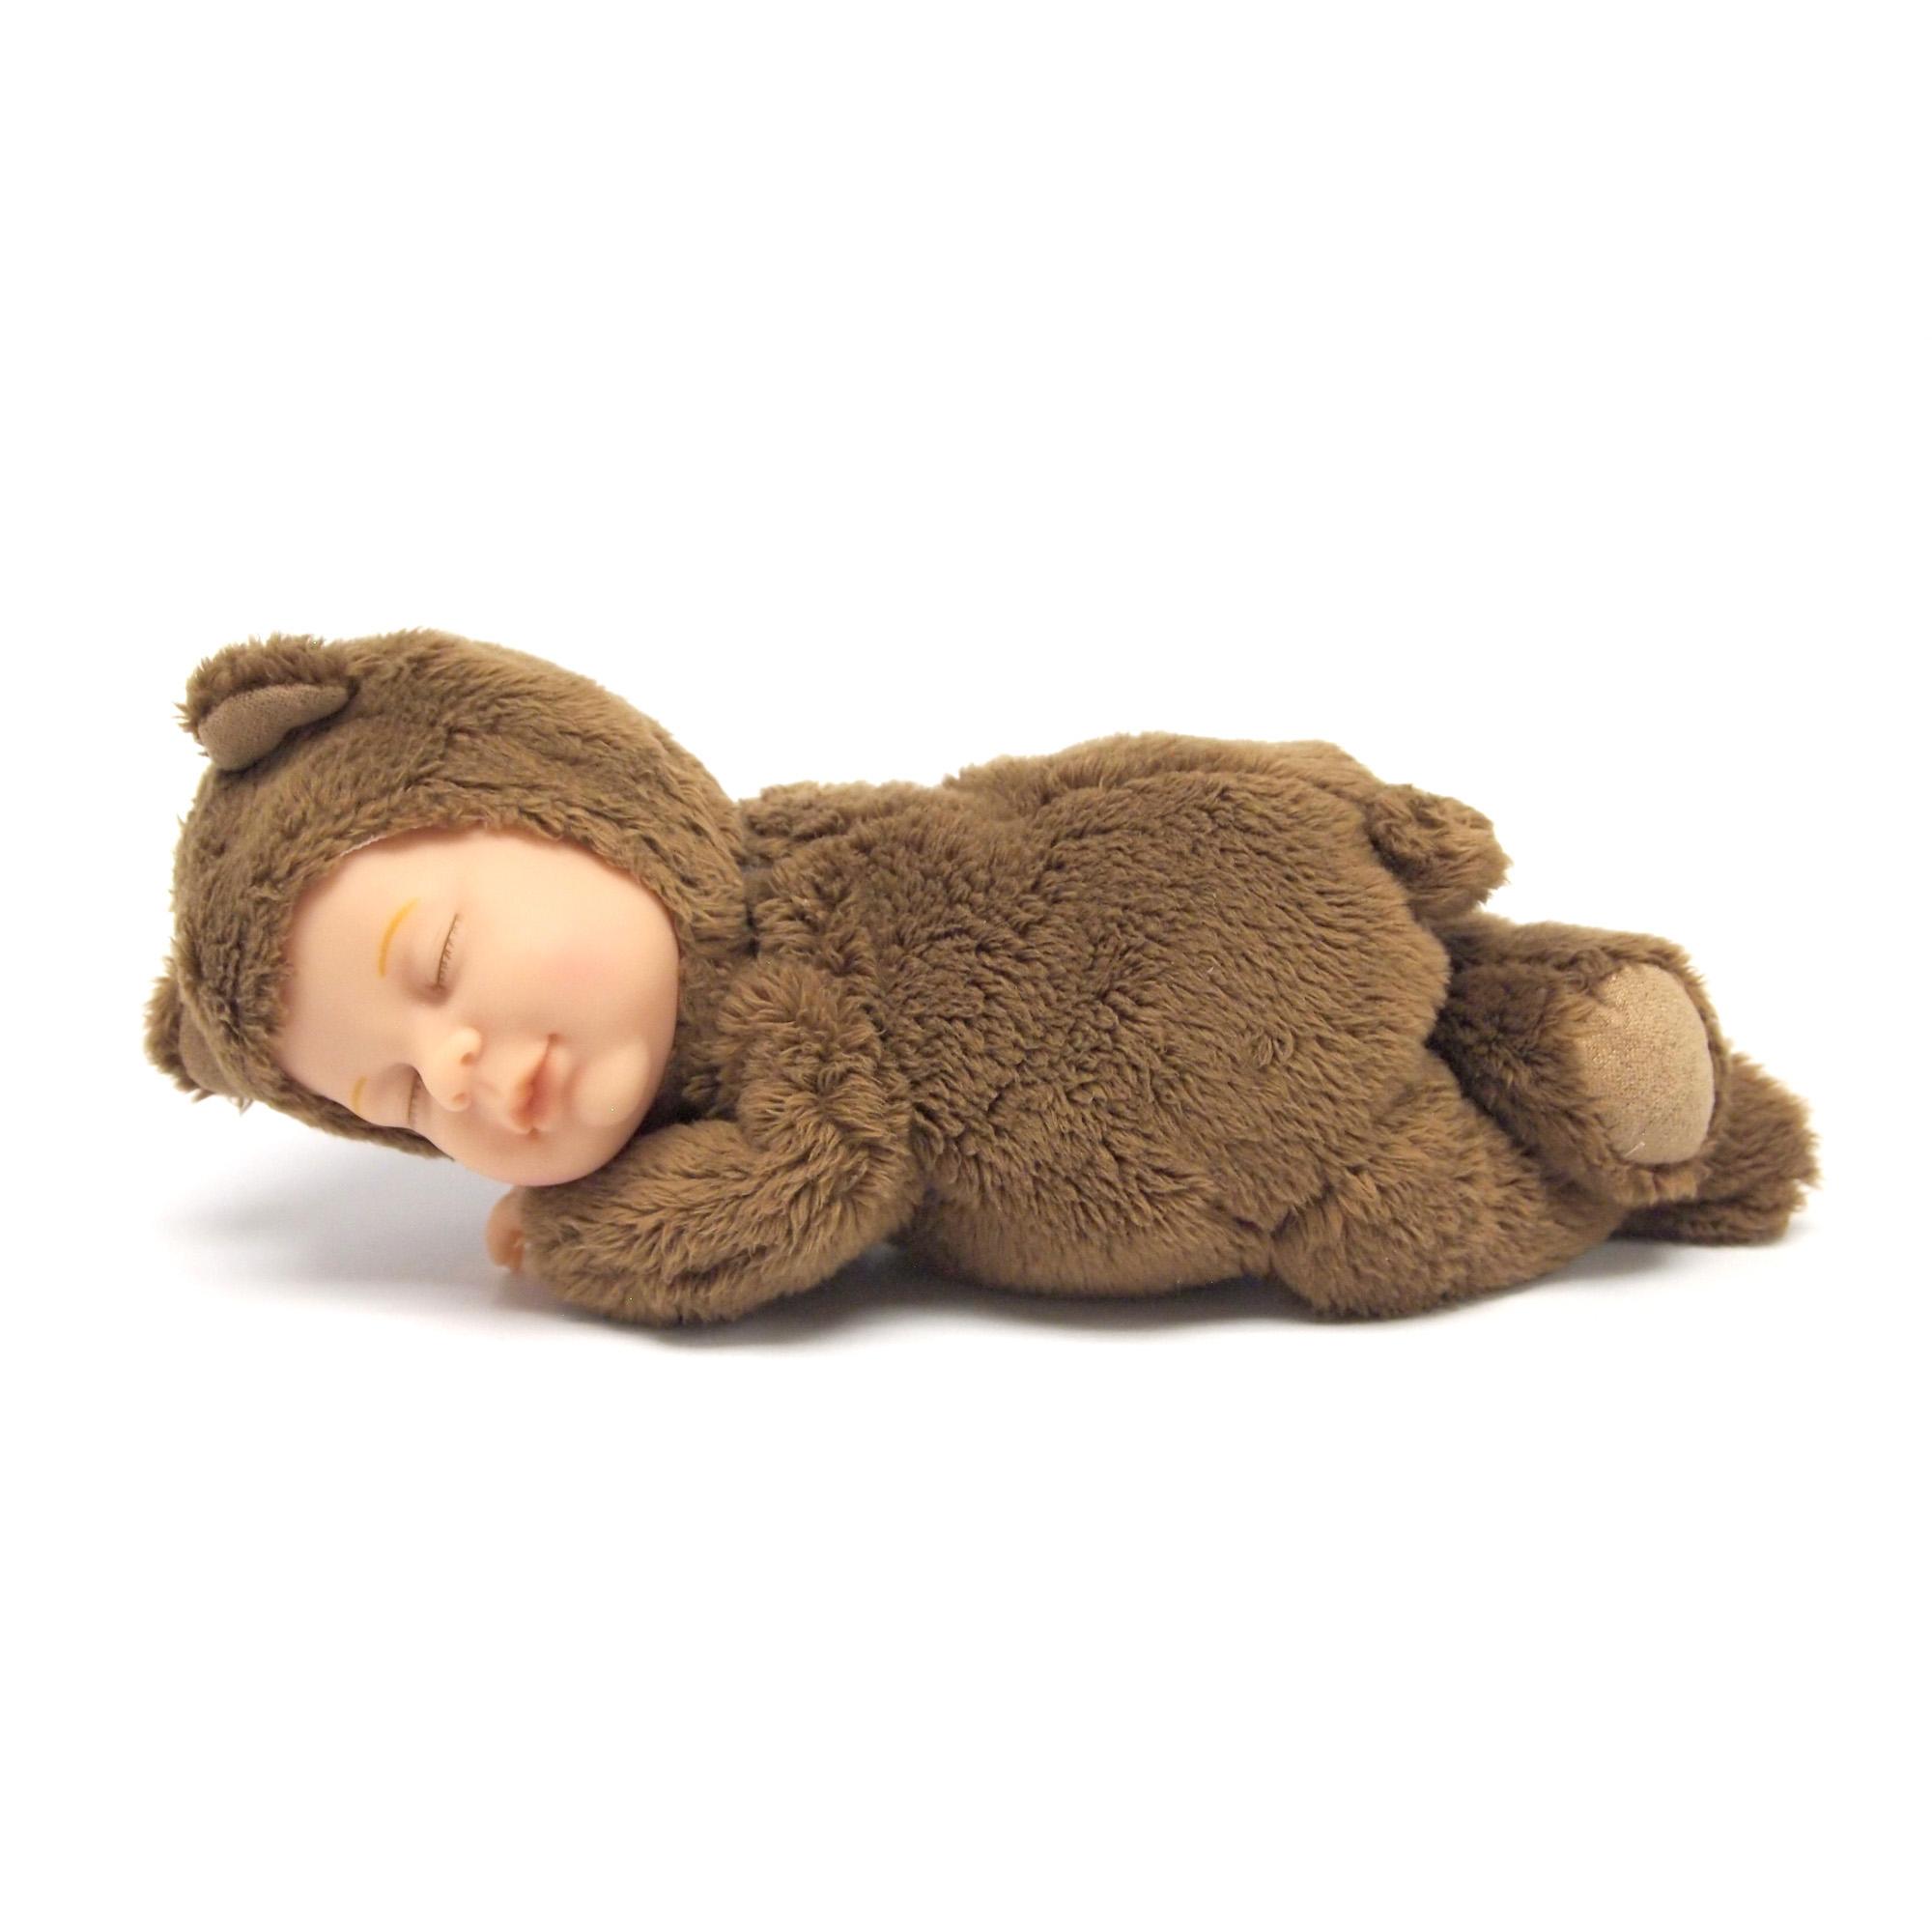 Baby Bear - Chocolate.JPG